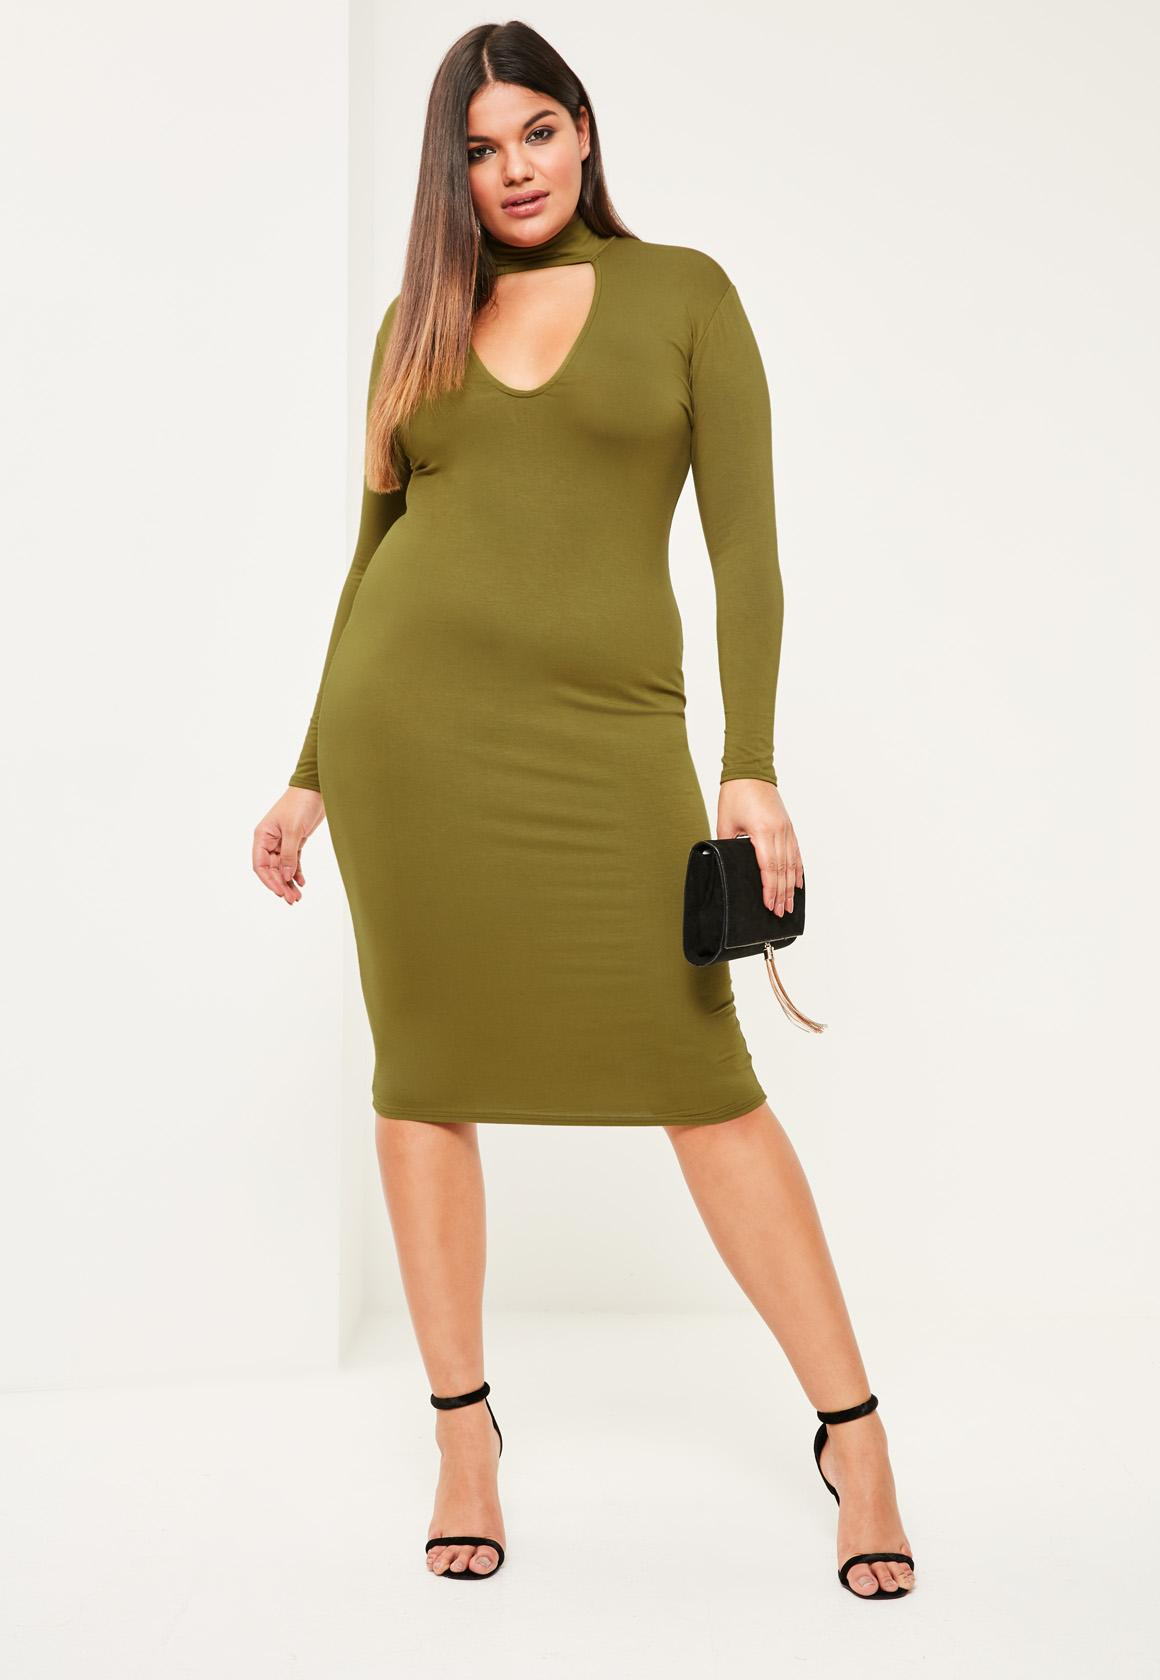 Plus Size Khaki Choker Neck Bodycon Dress - Missguided